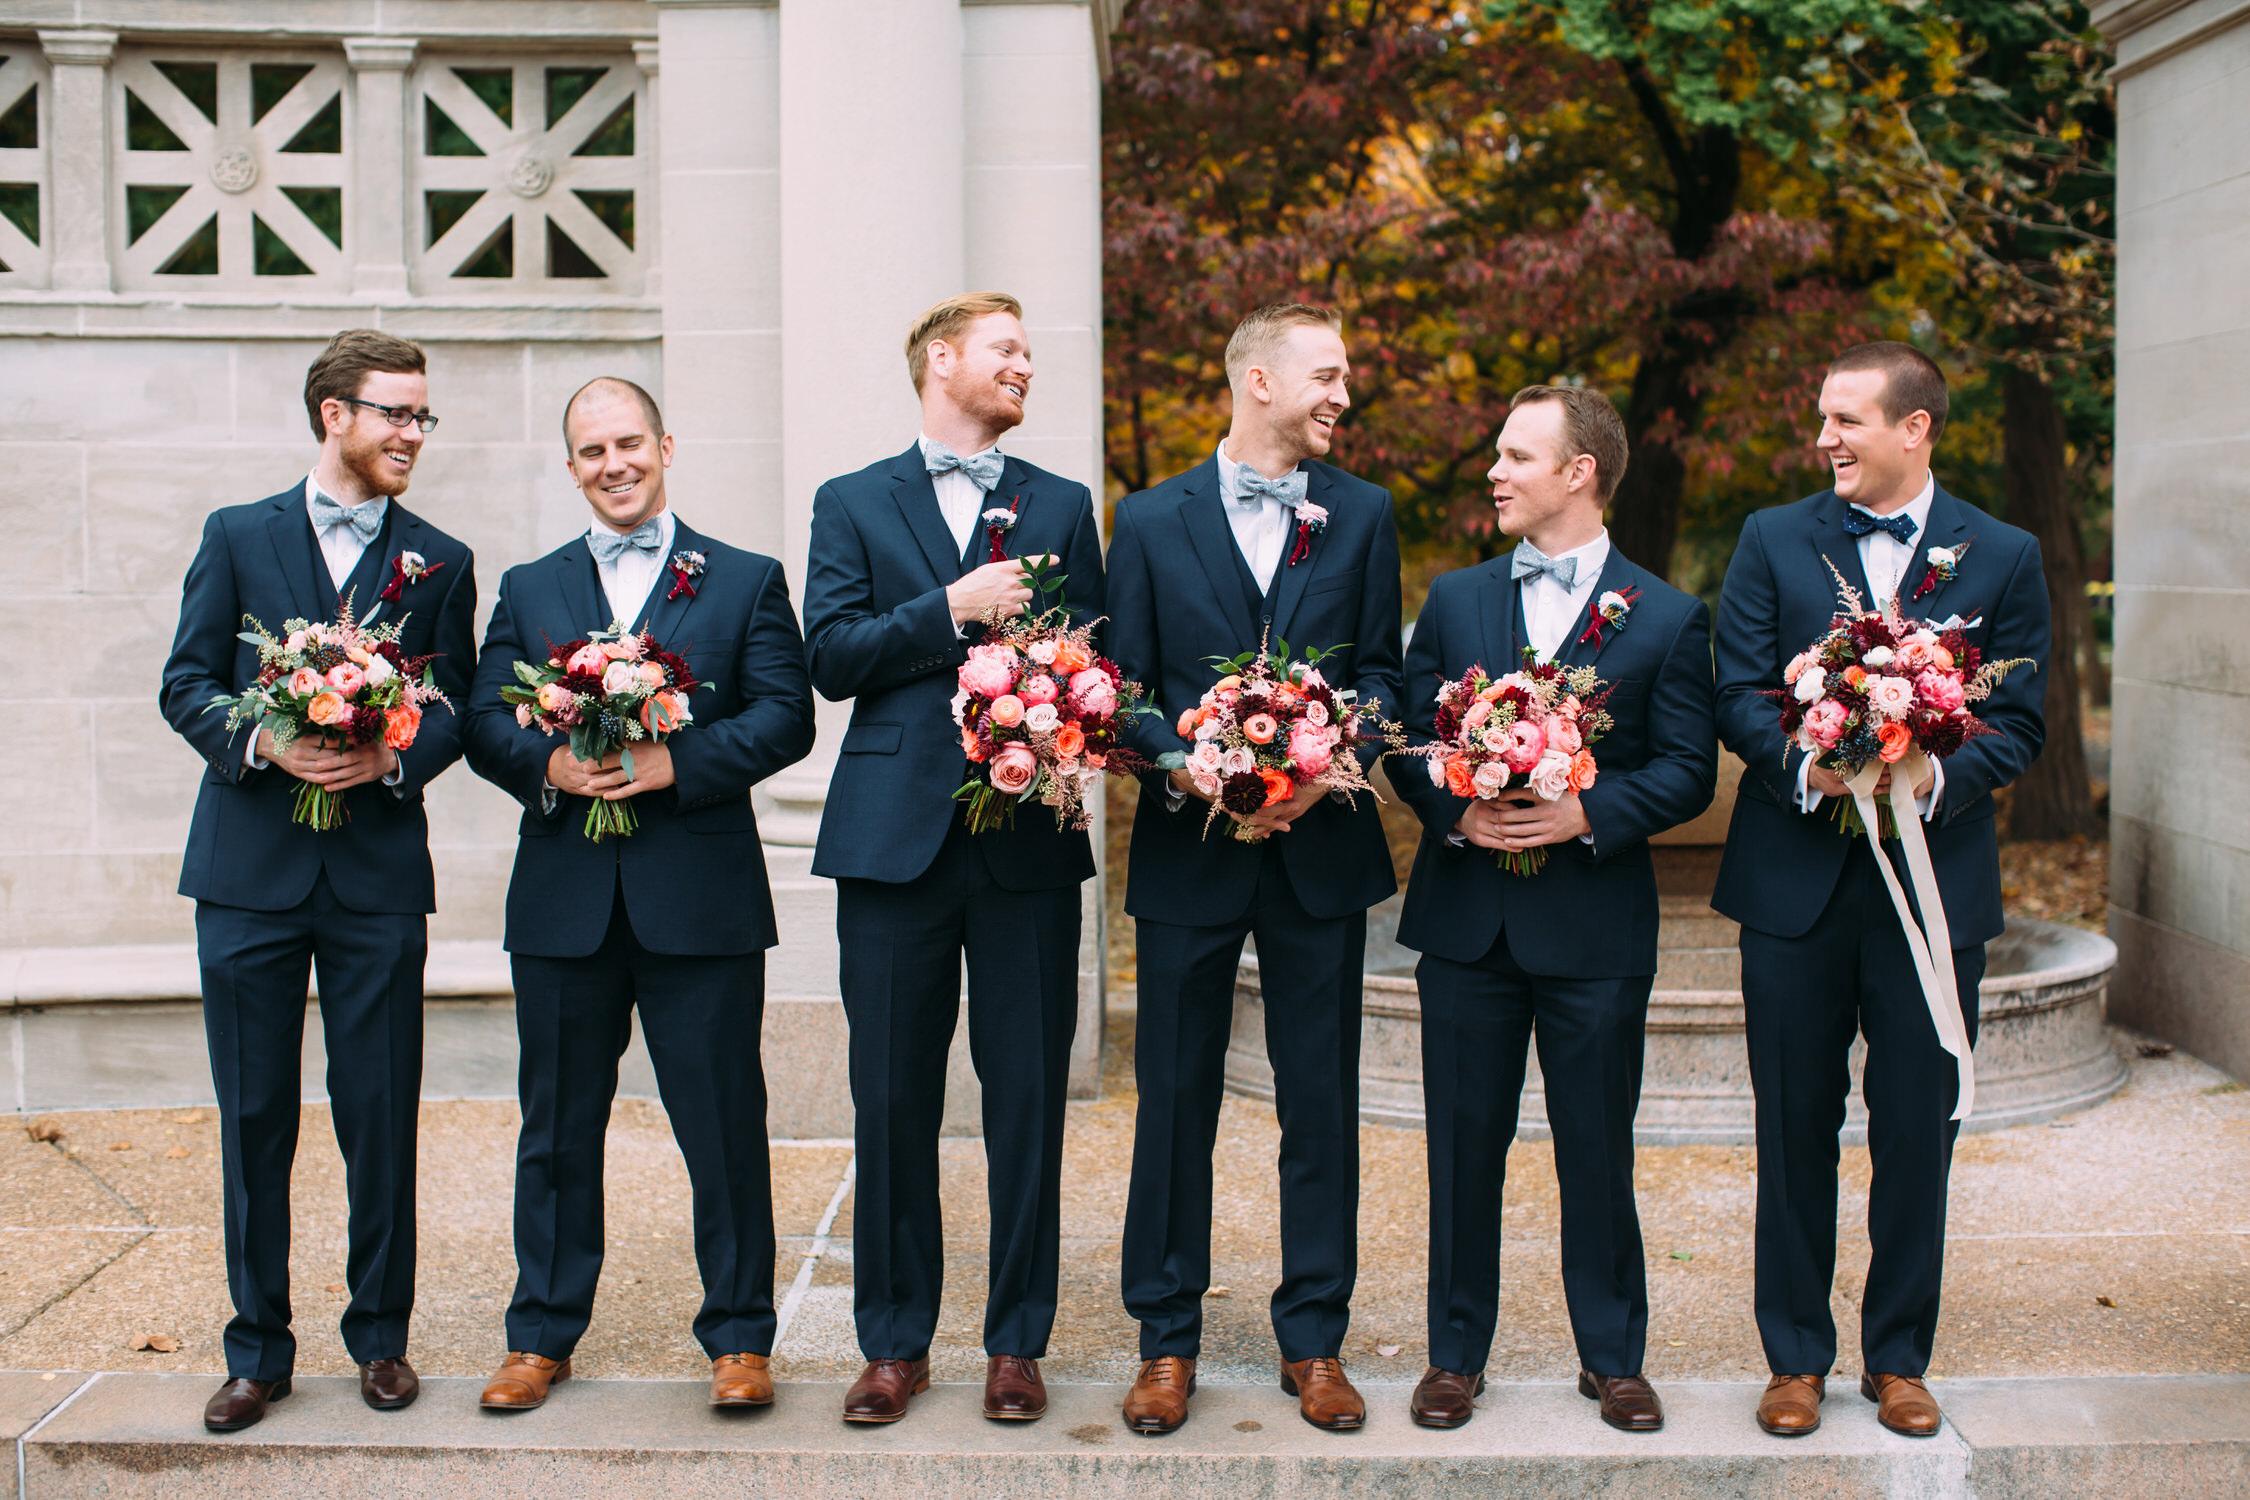 Groomsmen with Bouquets, St Louis Wedding